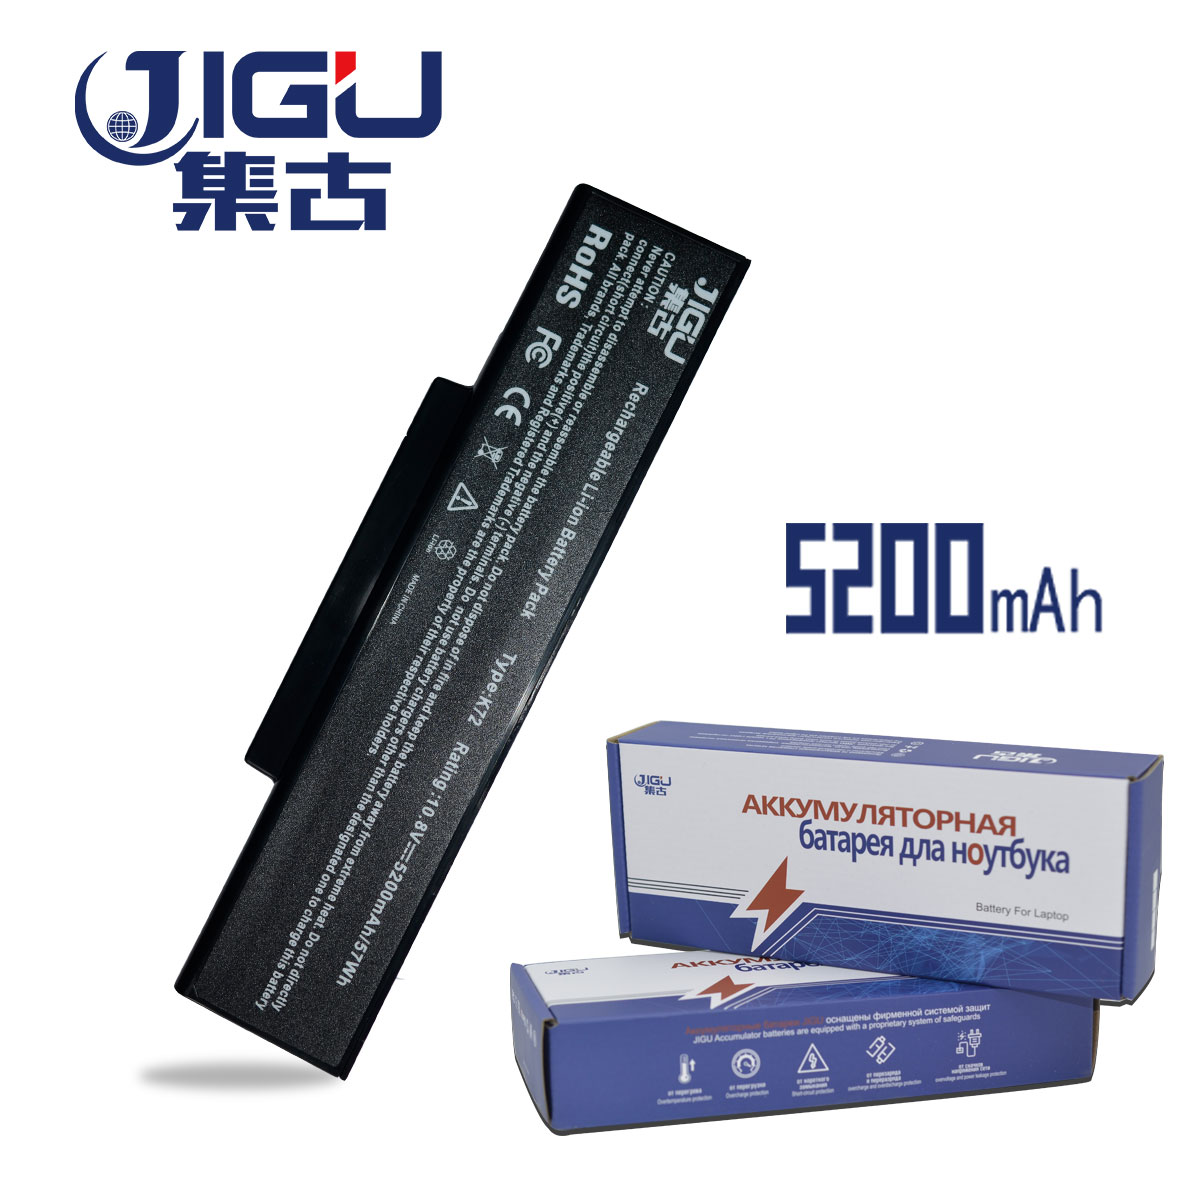 JIGU 6 Cell Laptop Battery For Asus A72 K72 N73 N71 K73 X77 Series Laptop A32-K72 A32-N71